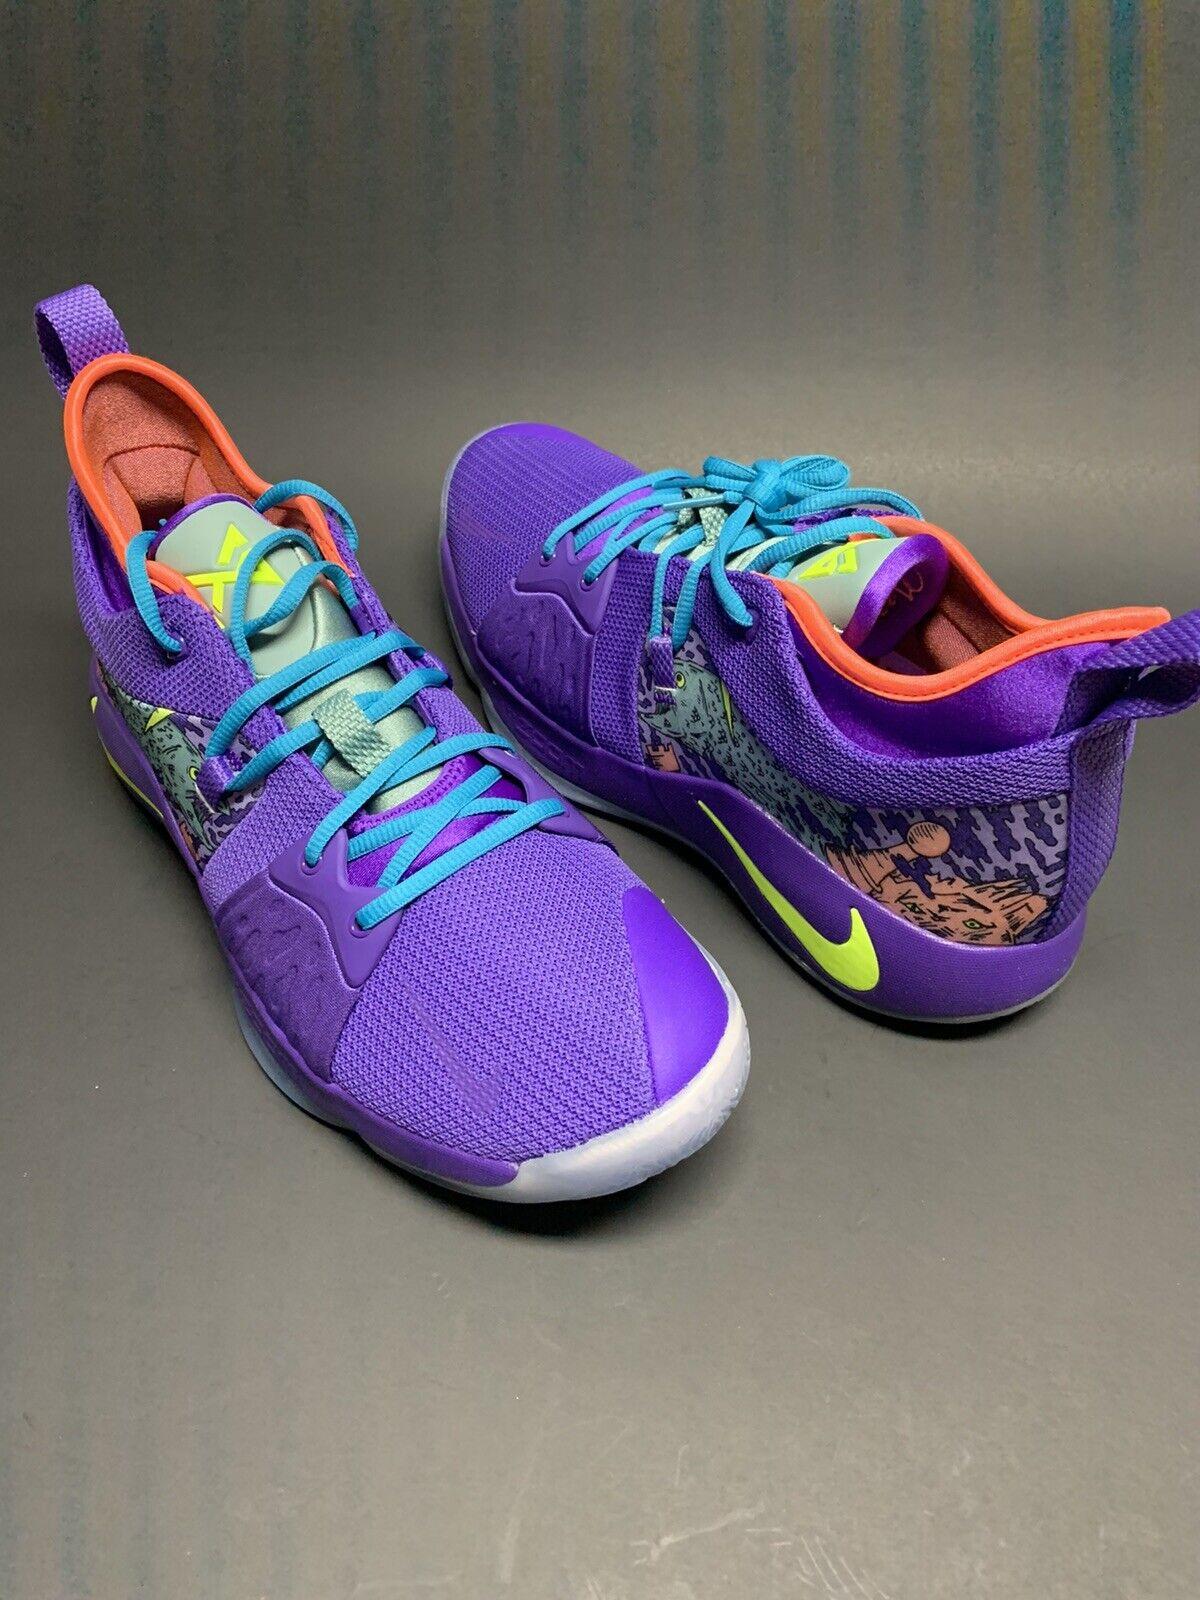 Nike PG 2 Mm Mamba Mentality Kobe